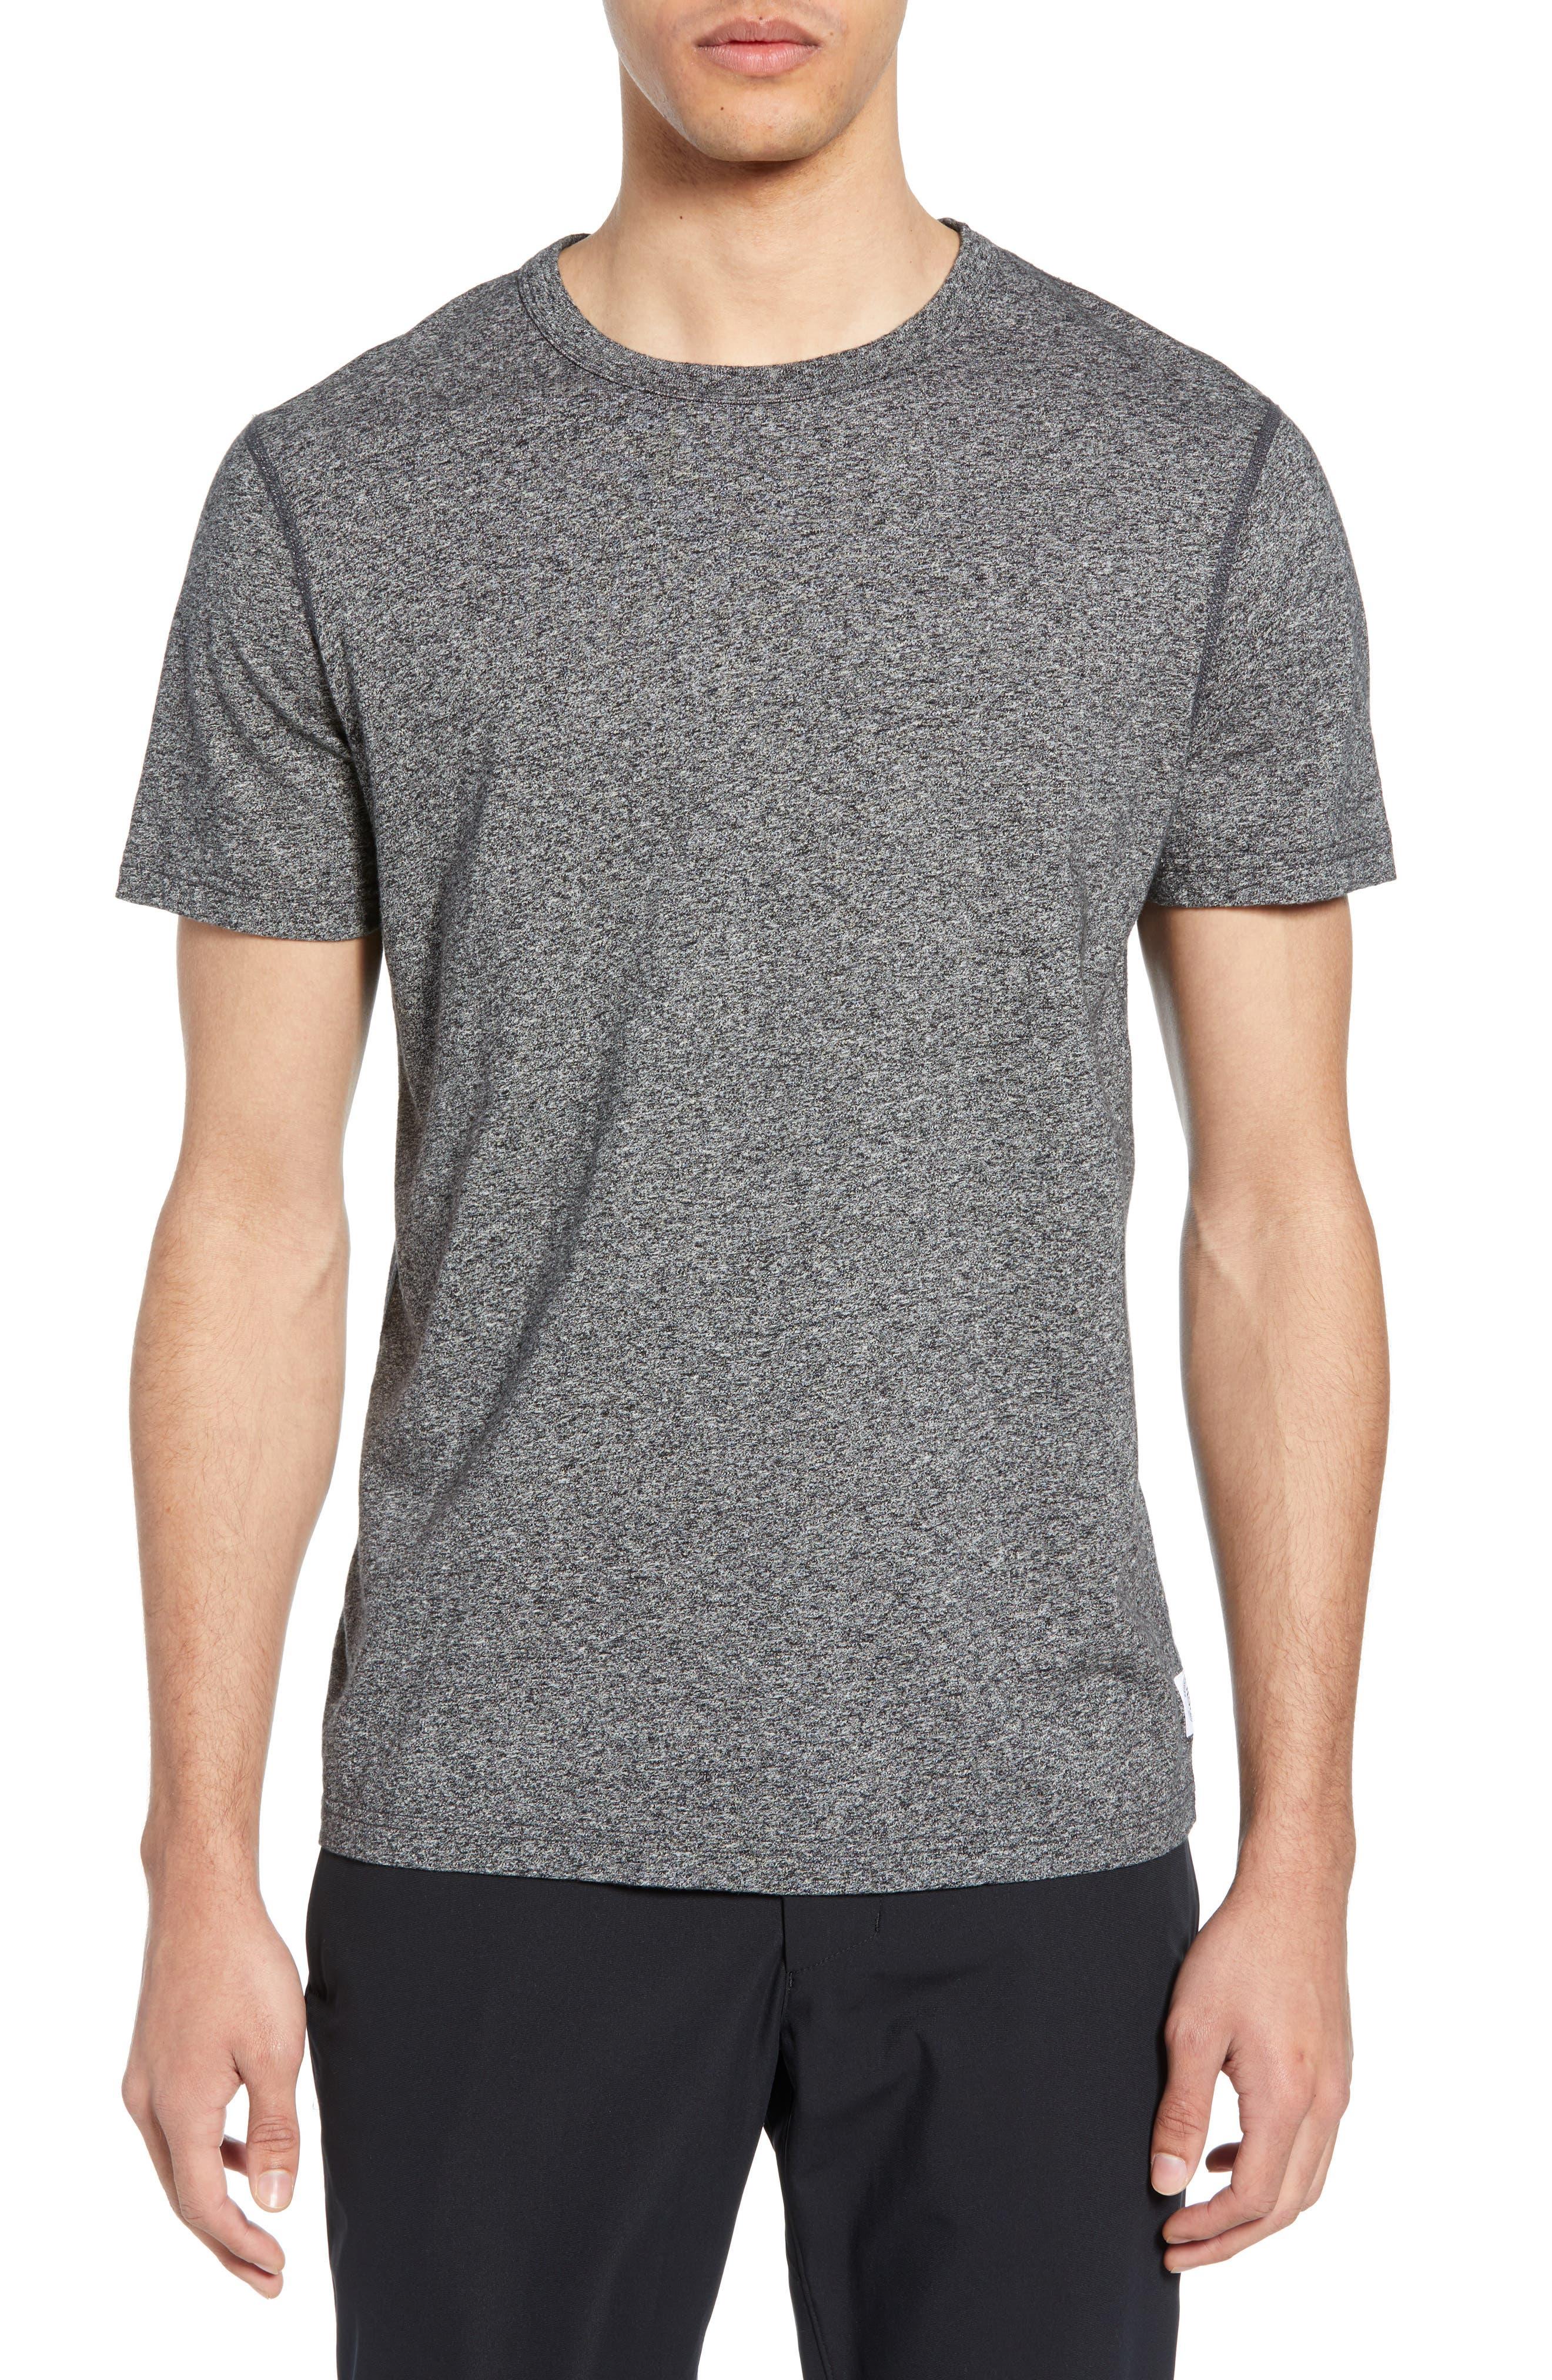 REIGNING CHAMP,                             Short Sleeve Crewneck T-Shirt,                             Main thumbnail 1, color,                             MEDIUM BLACK